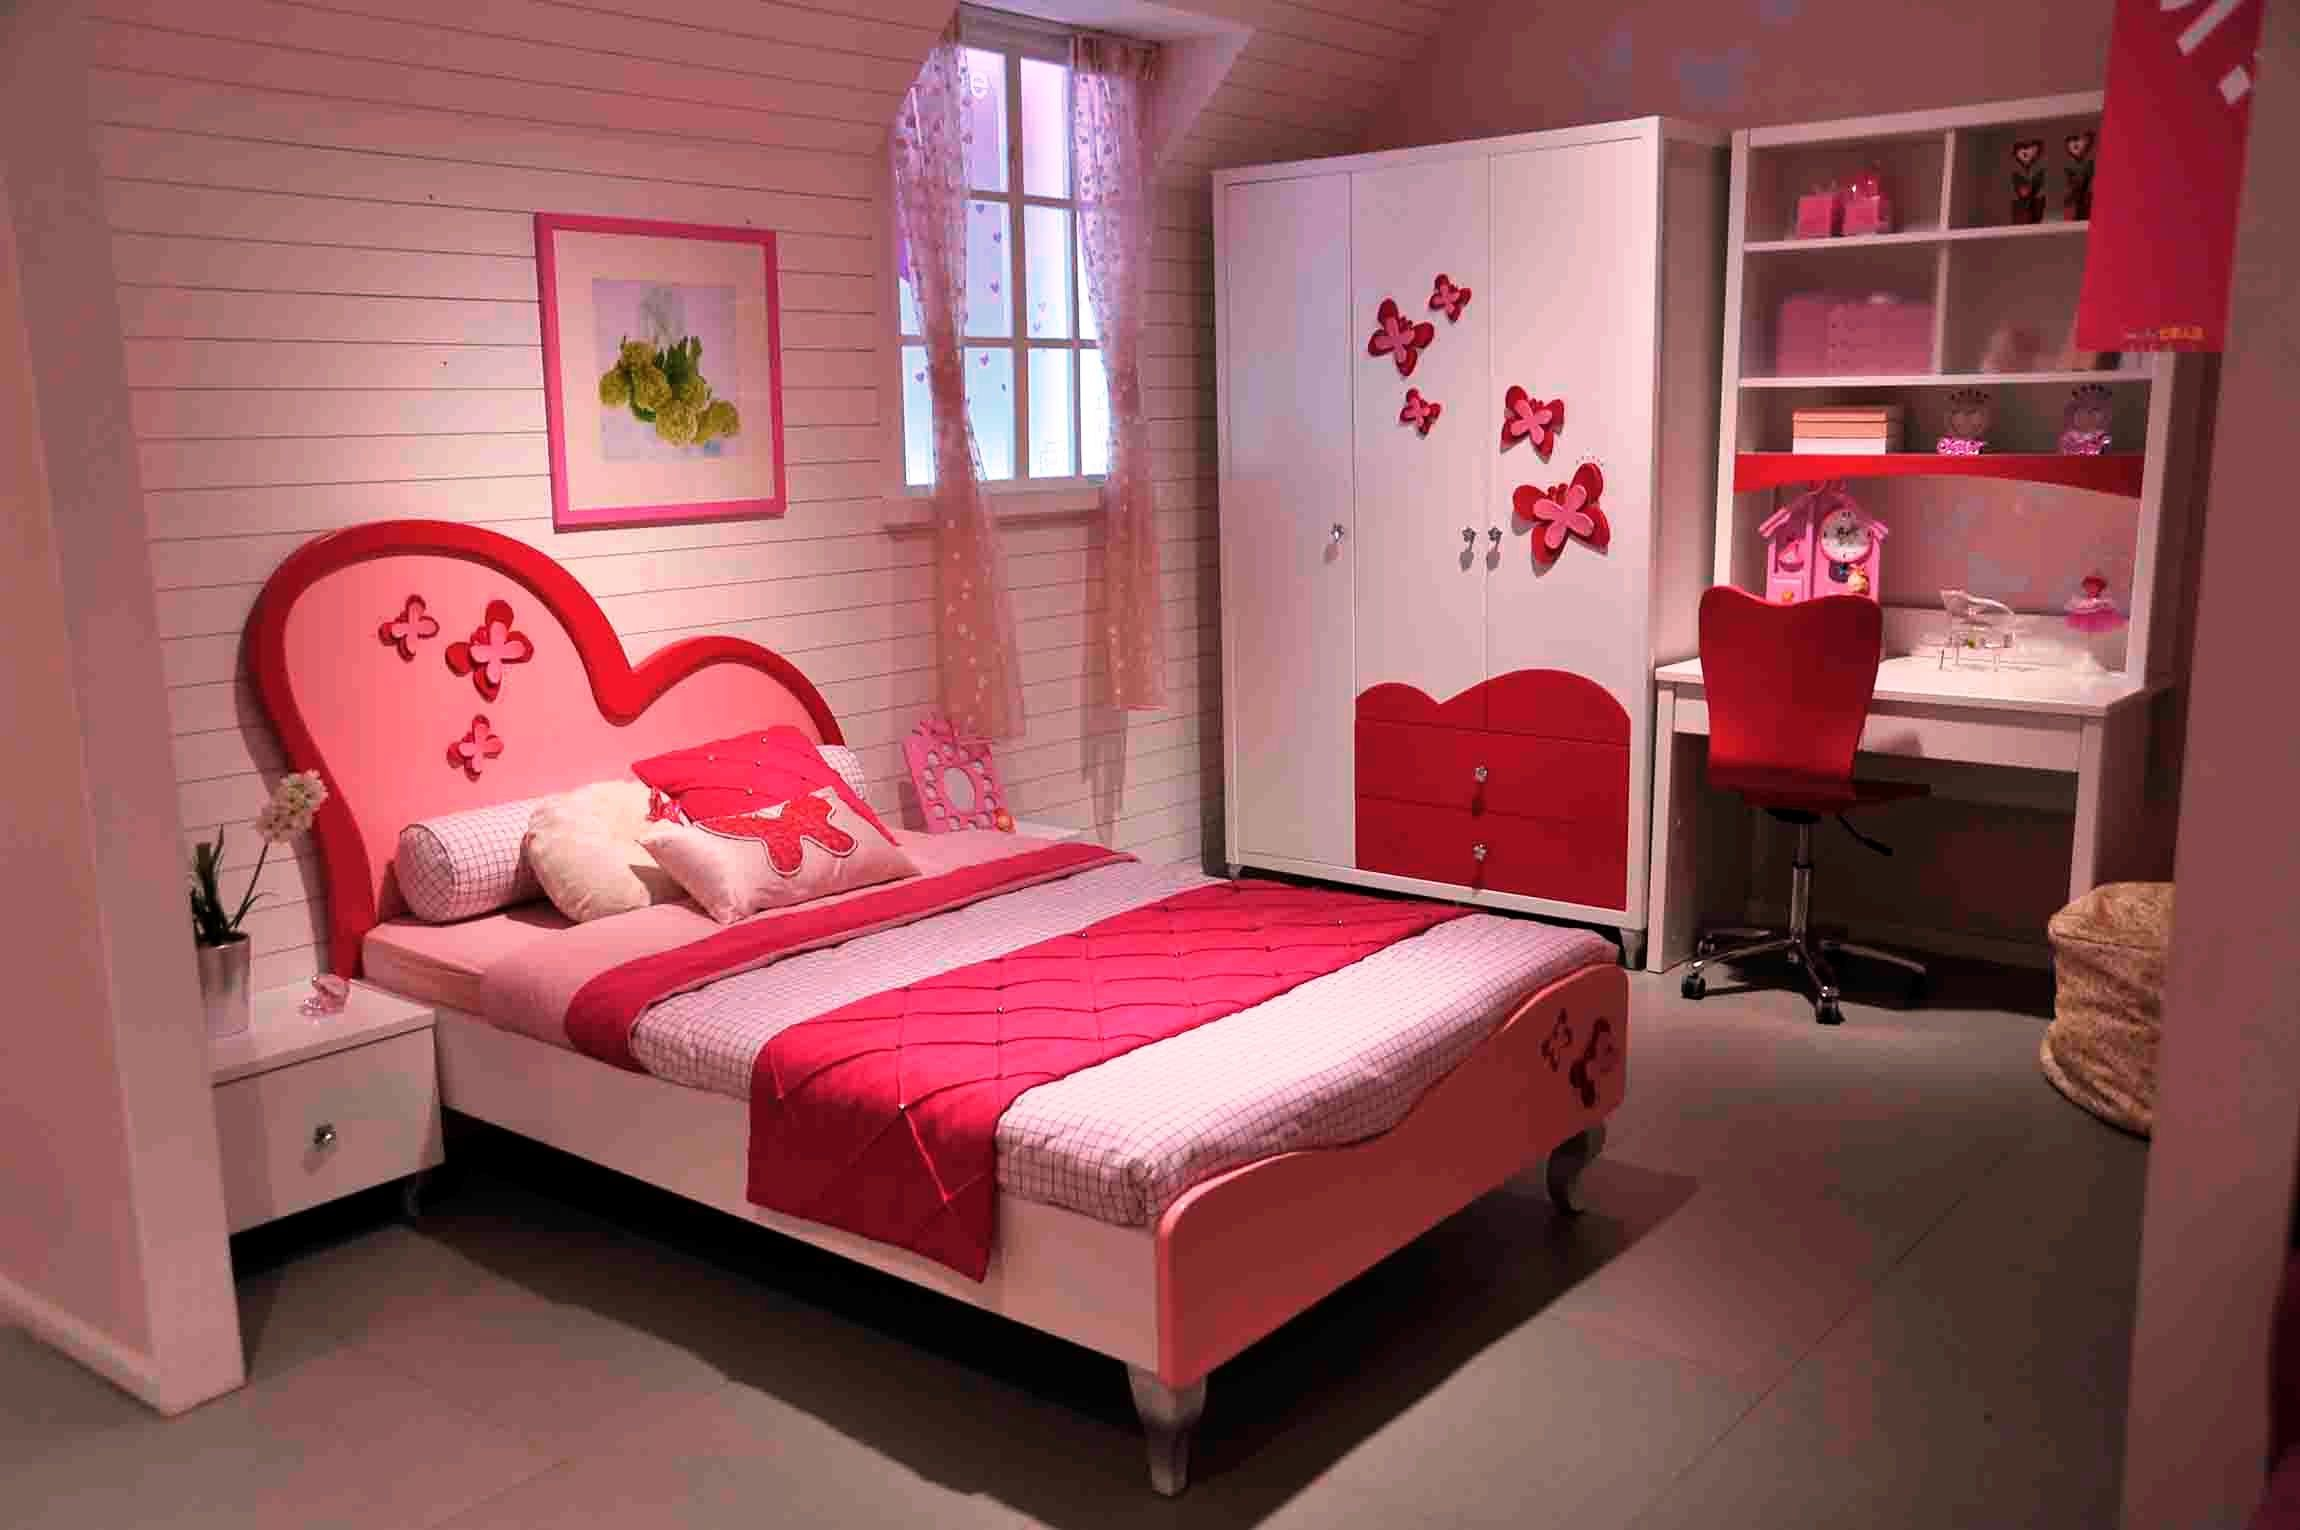 صور غرف نوم بنات اجمل غرفة نوم بنات 2019 قلوب فتيات